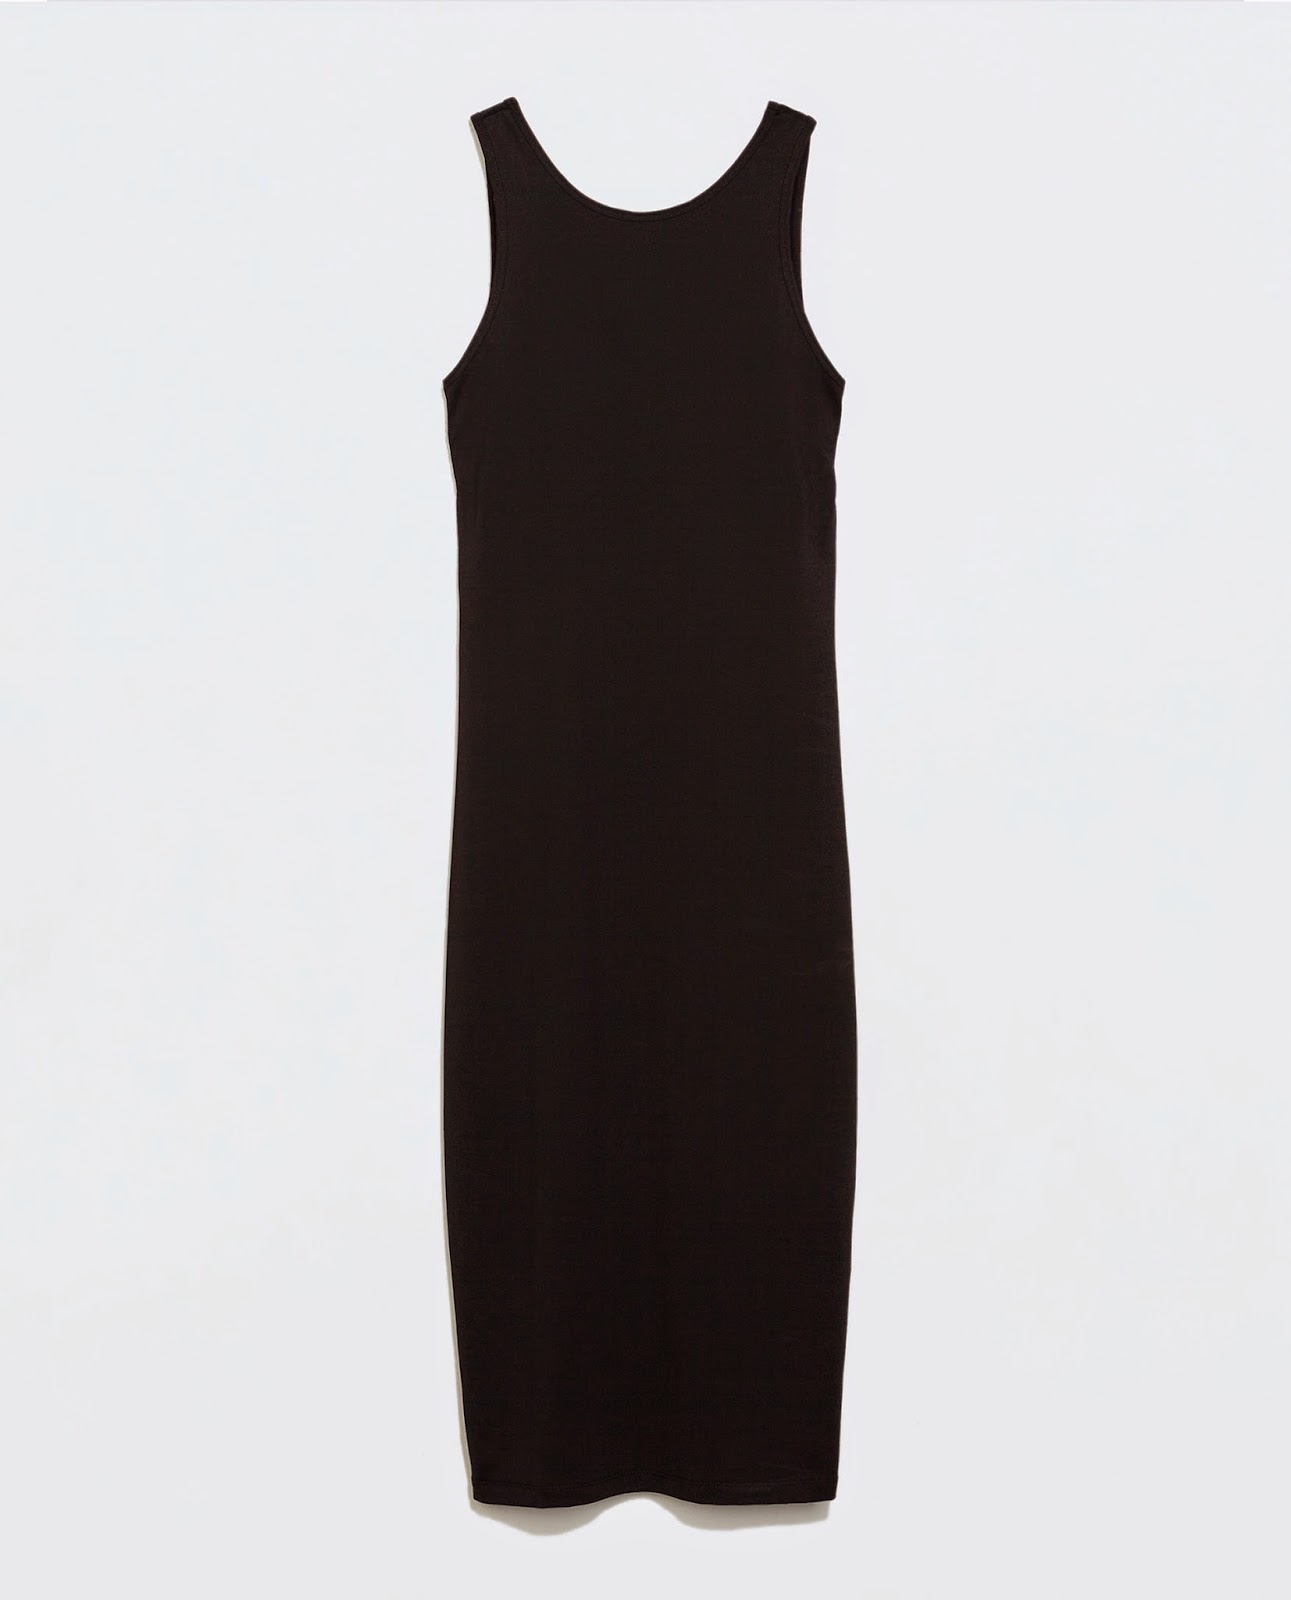 Look Zara, pants, bomber, shirt, dress, style, blog de moda, fashion style, cool, outfit, girls, moda, trendy